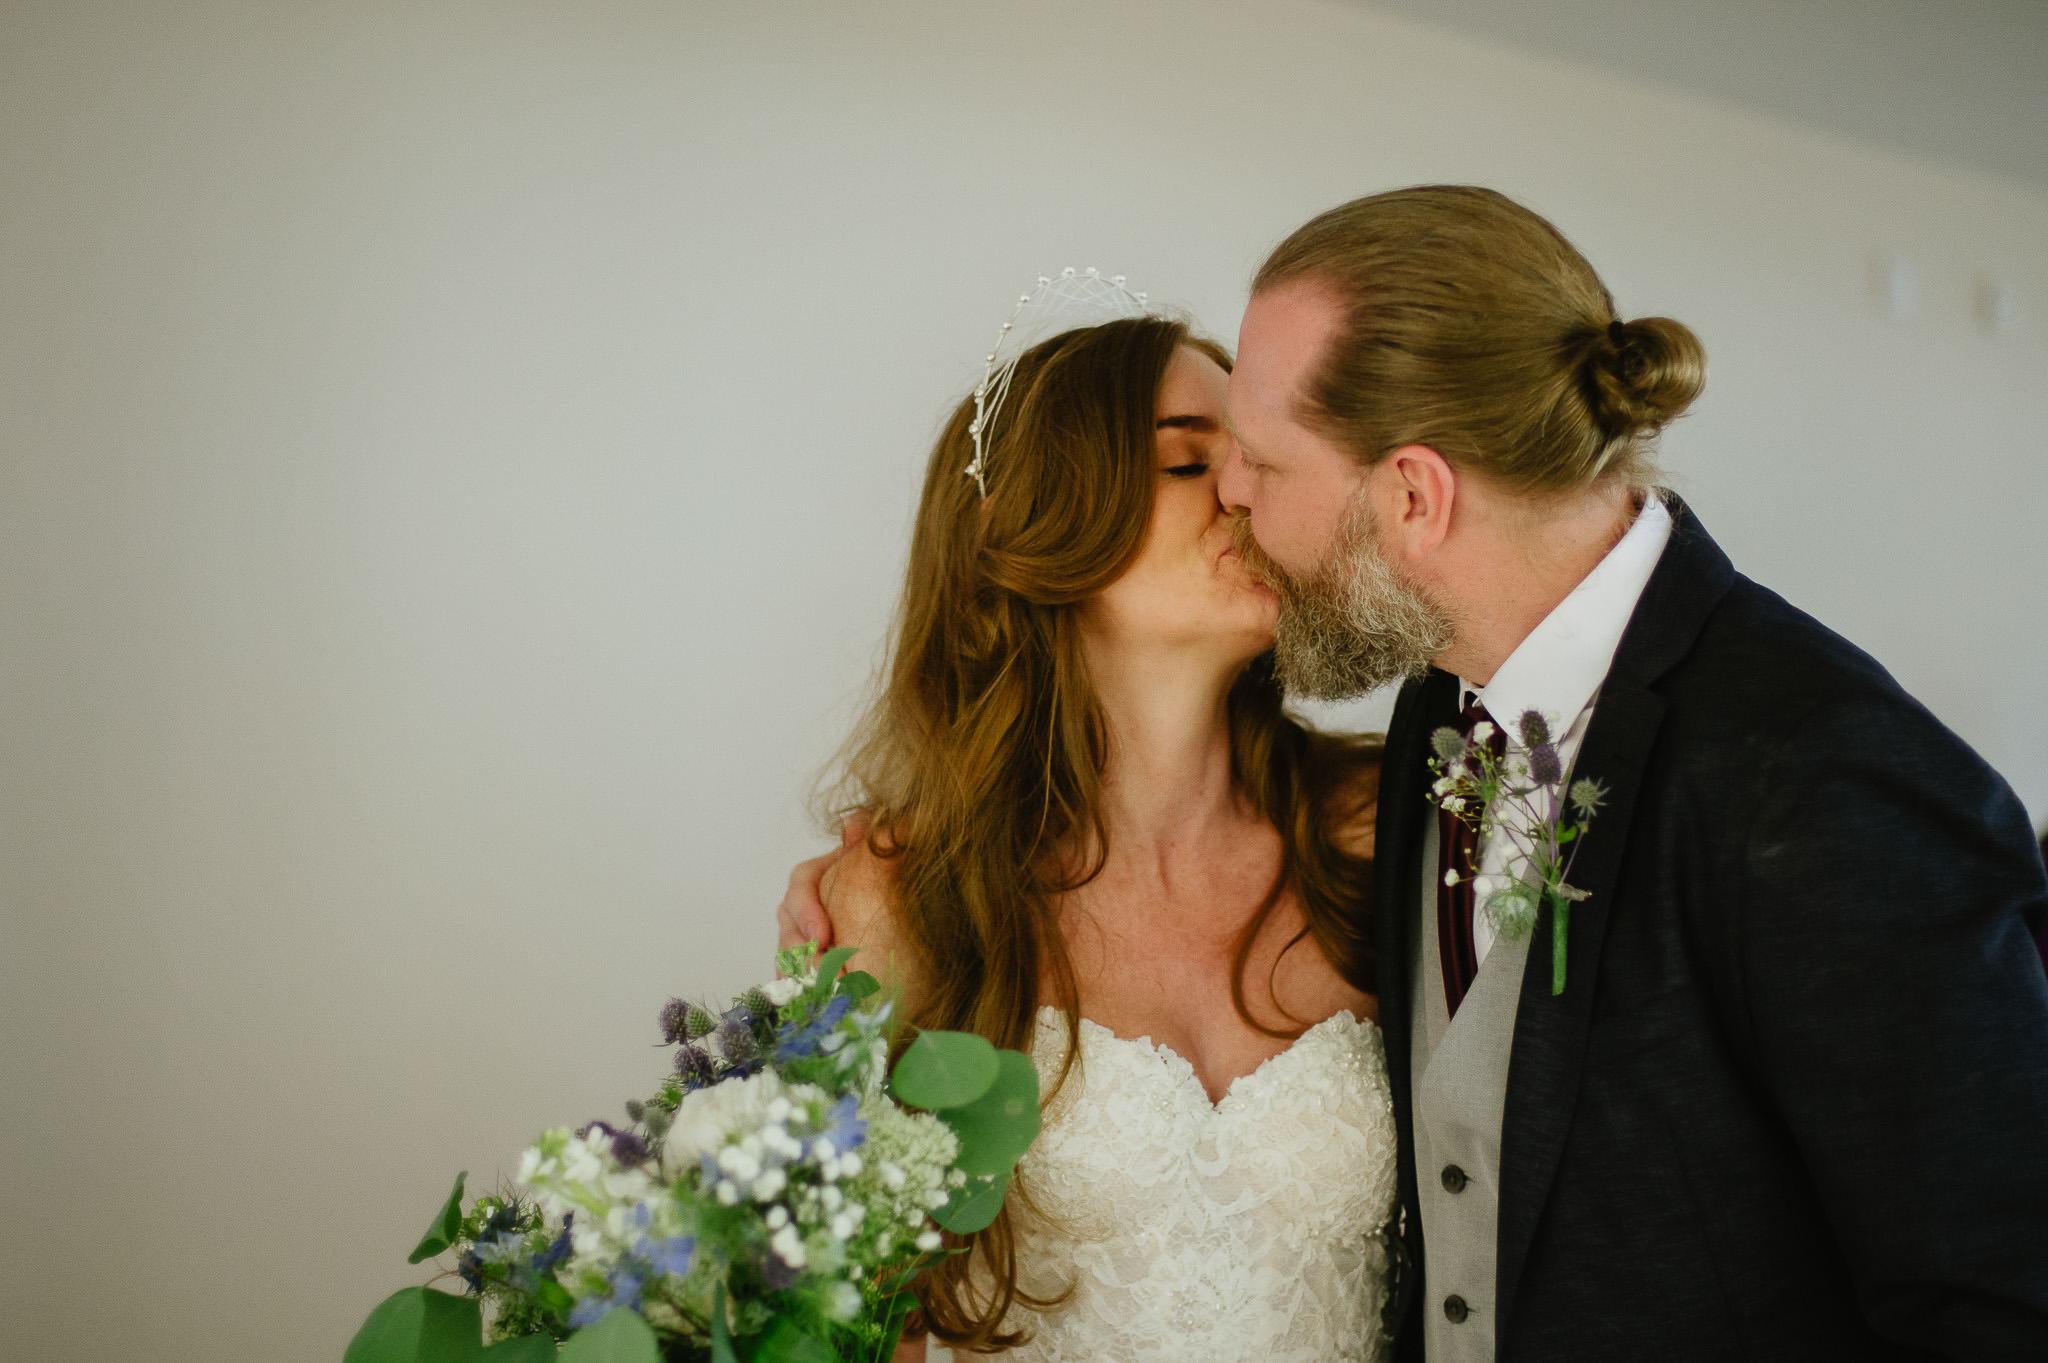 Cliff House Hotel Wedding Photographer Ireland-125.jpg